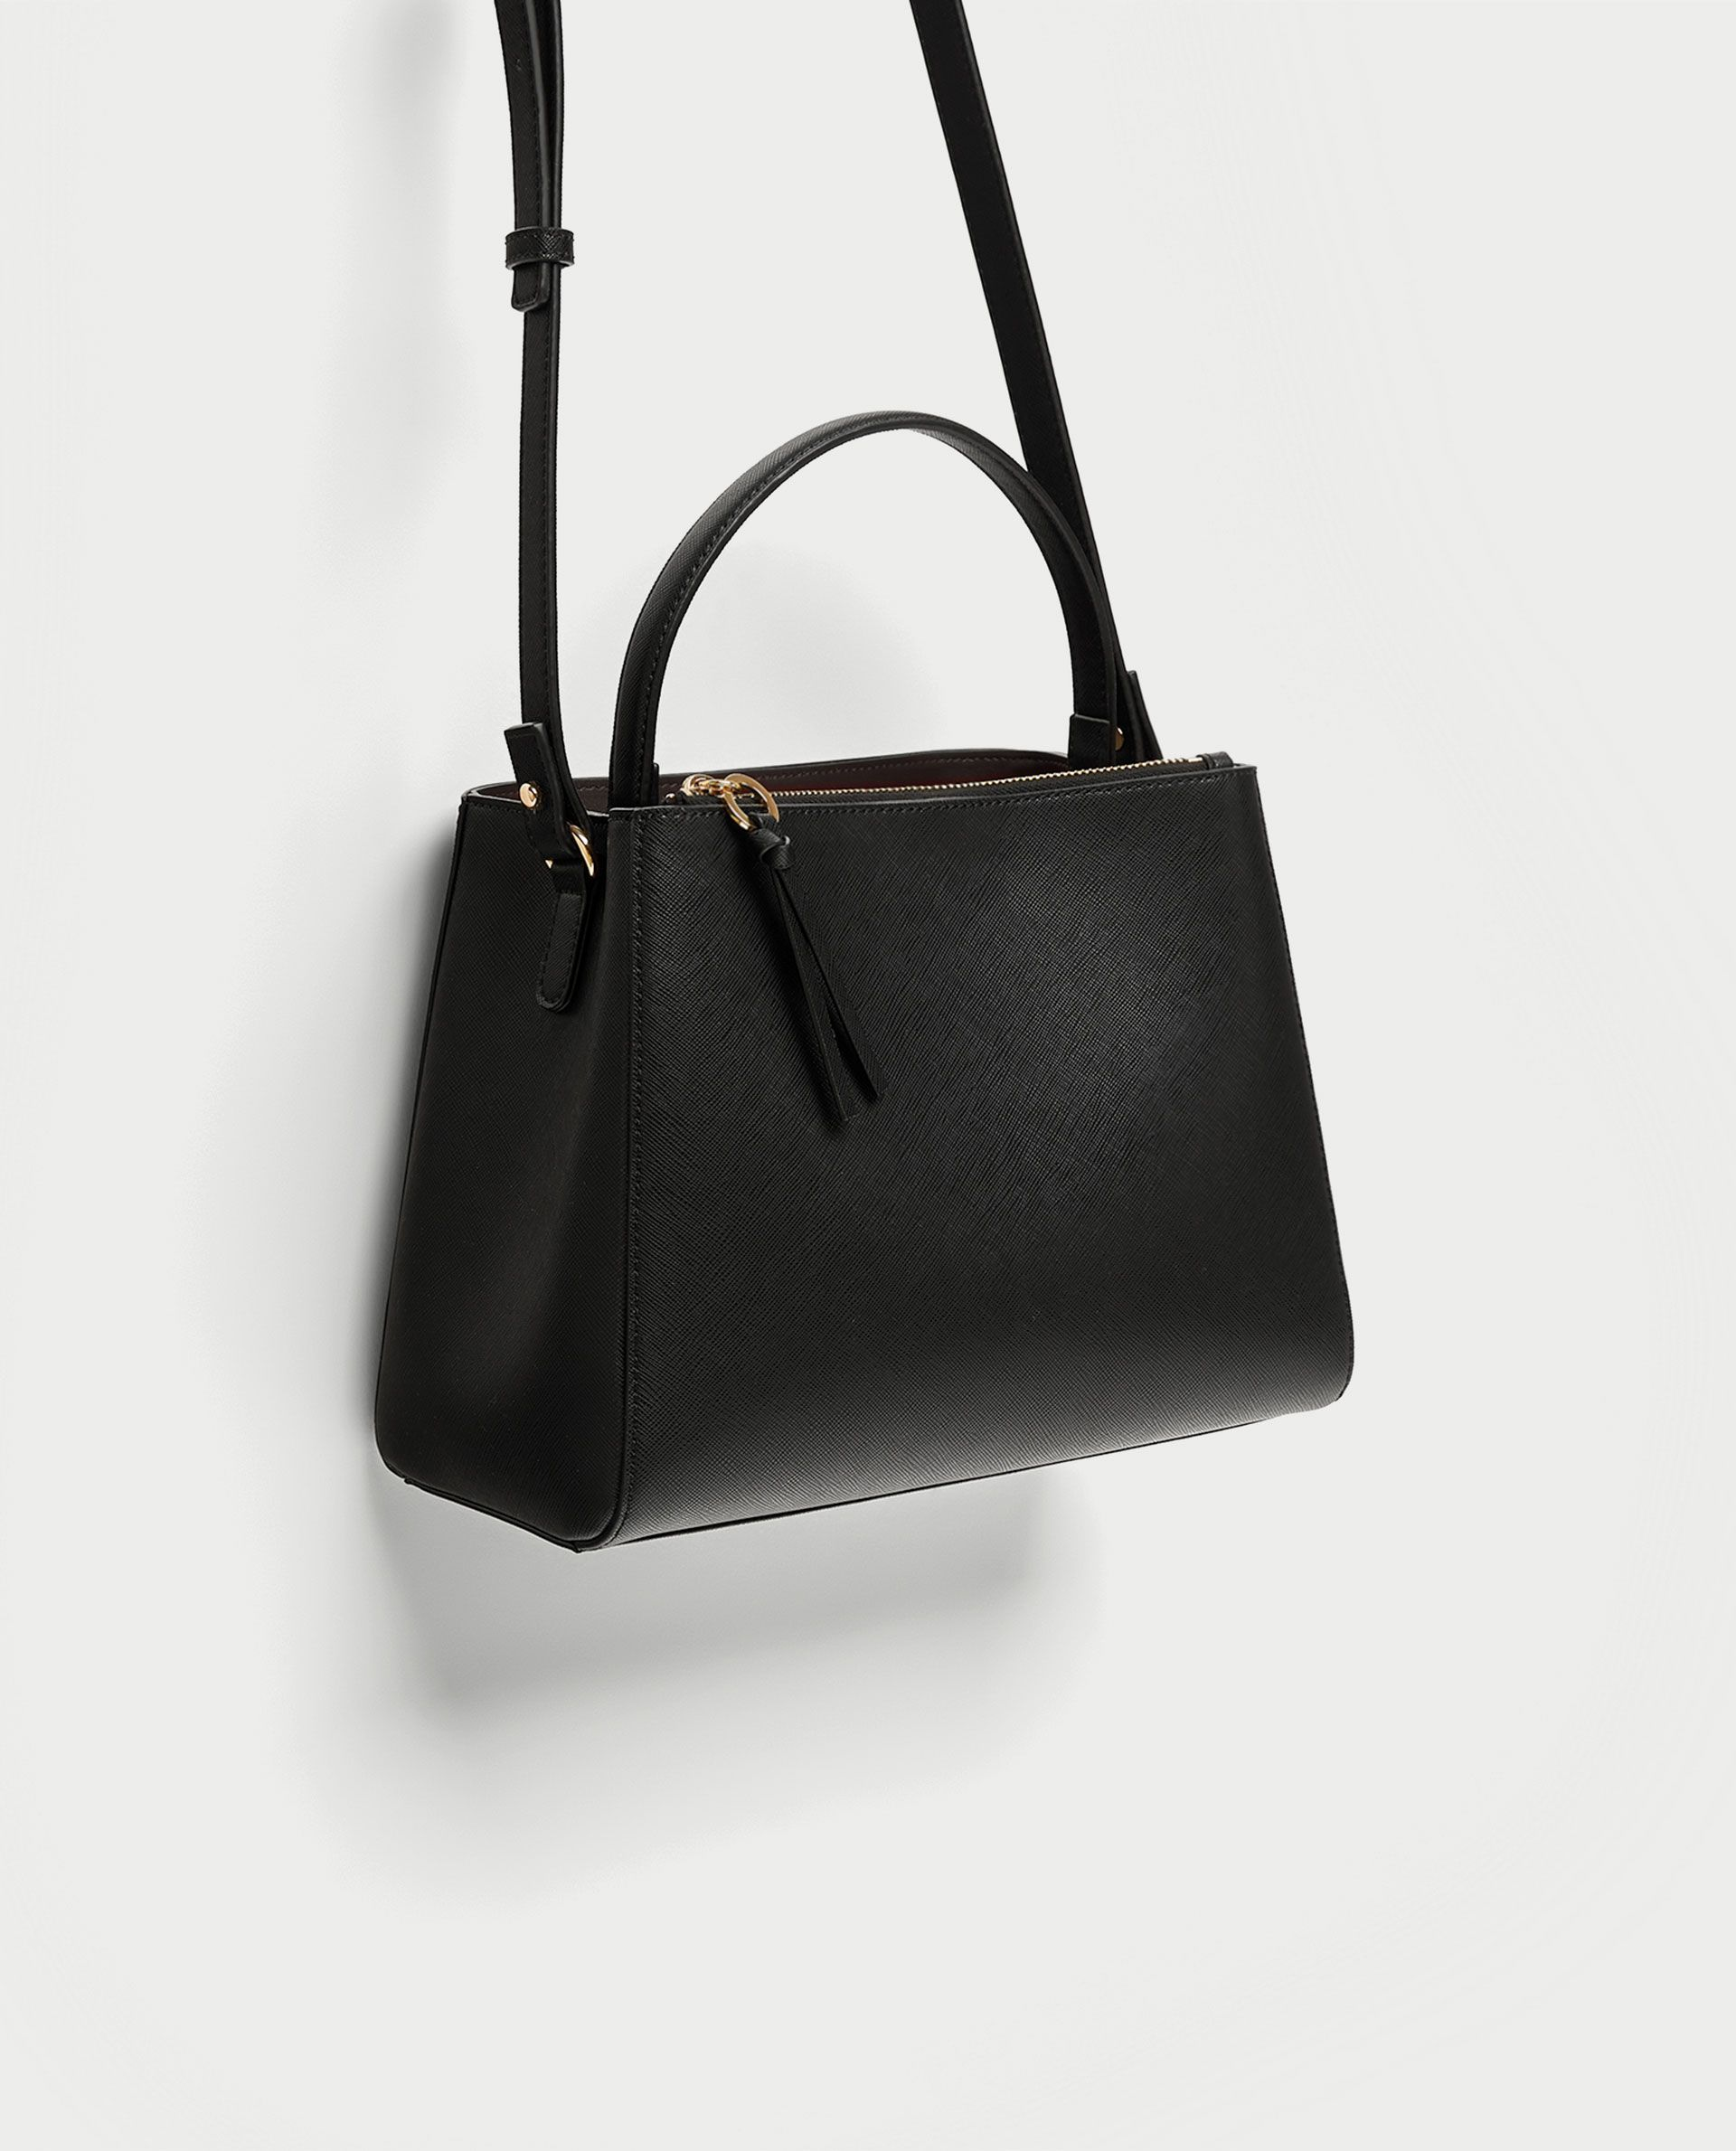 2f82b5aafa Image 3 of MEDIUM TOTE BAG WITH ZIP from Zara | accessories | Womens ...